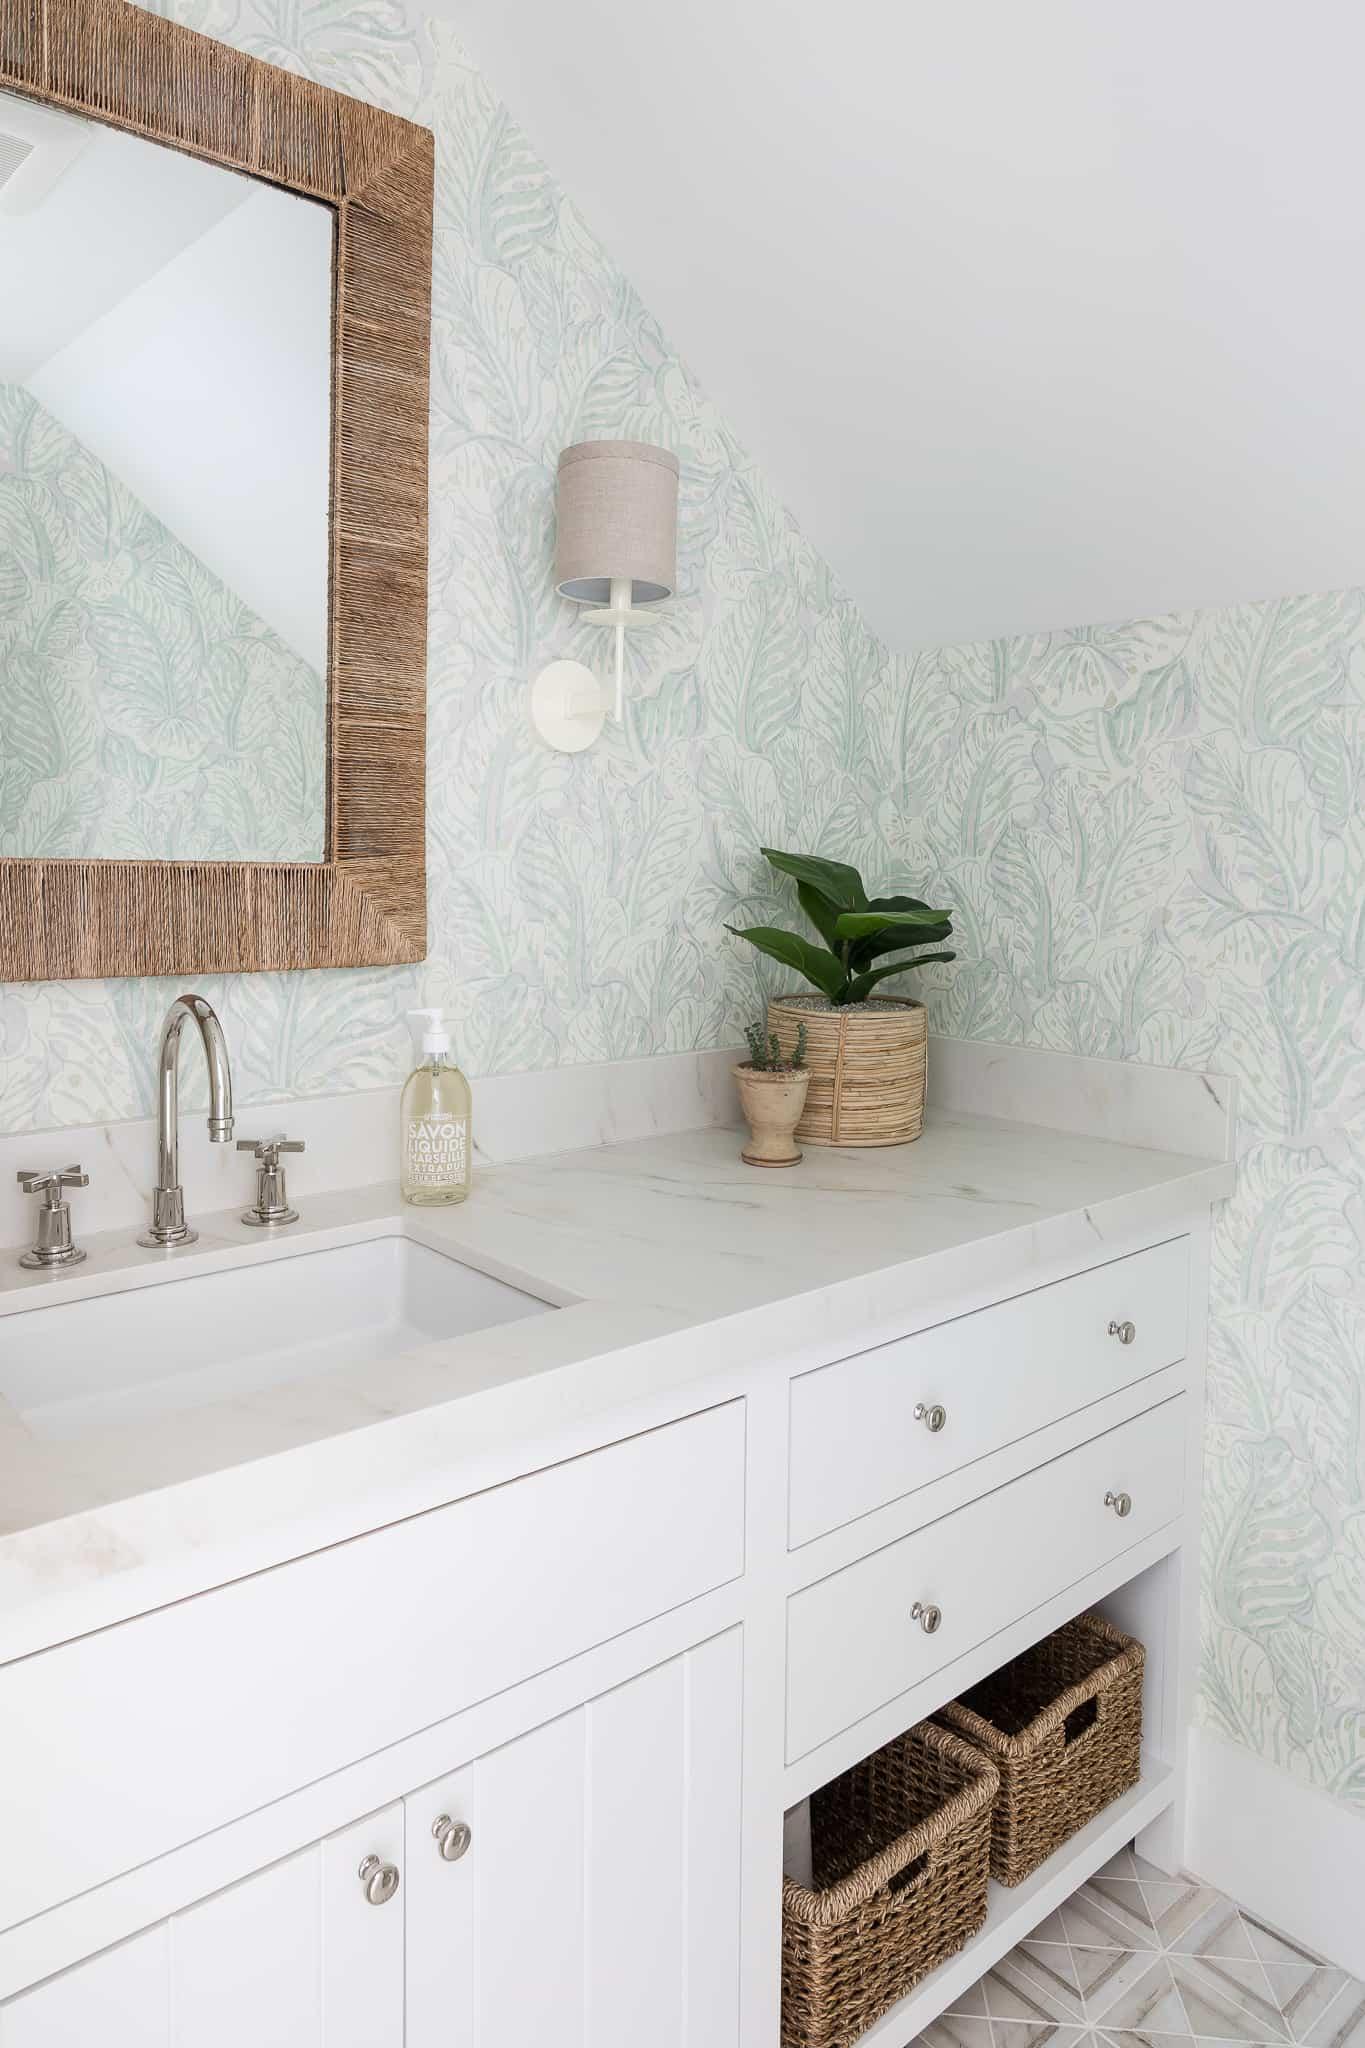 Port Newport Project - Mindy Gayer Design Co. - Coastal Family Home Powder Room